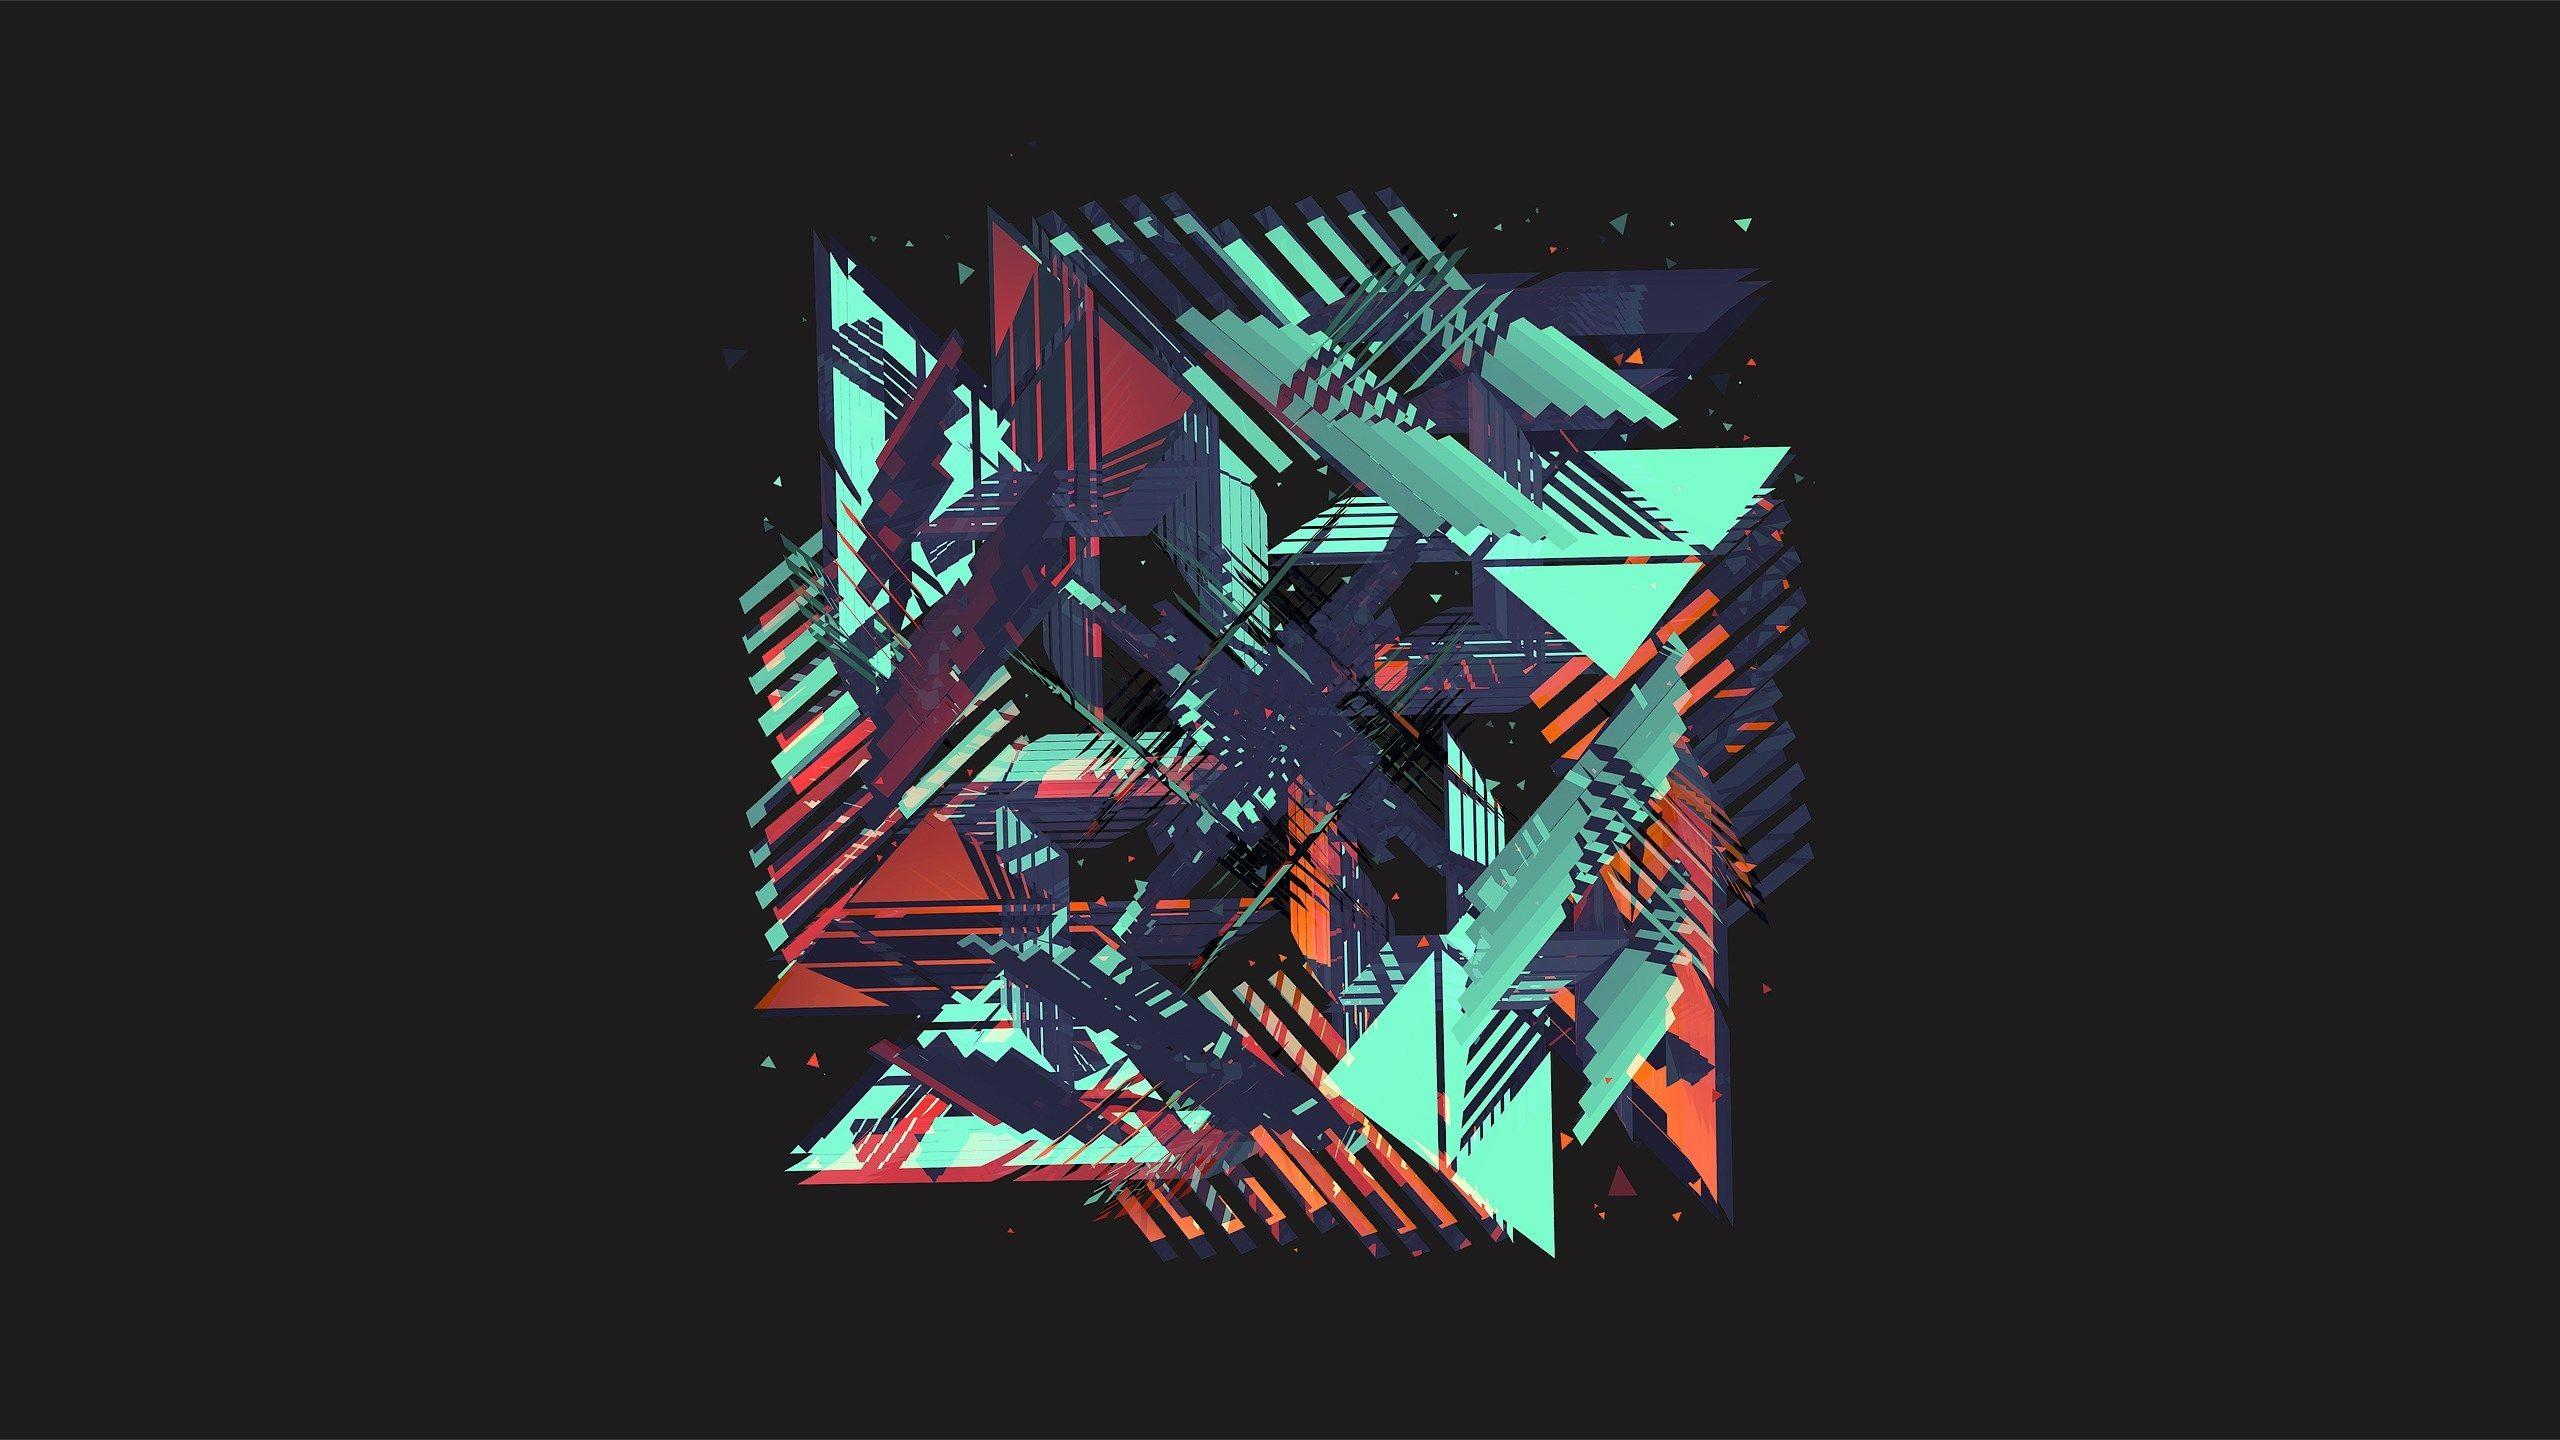 2560x1440, Abstract Hipster Wallpaper For Desktop Background - Hipster Wallpaper Hd - HD Wallpaper